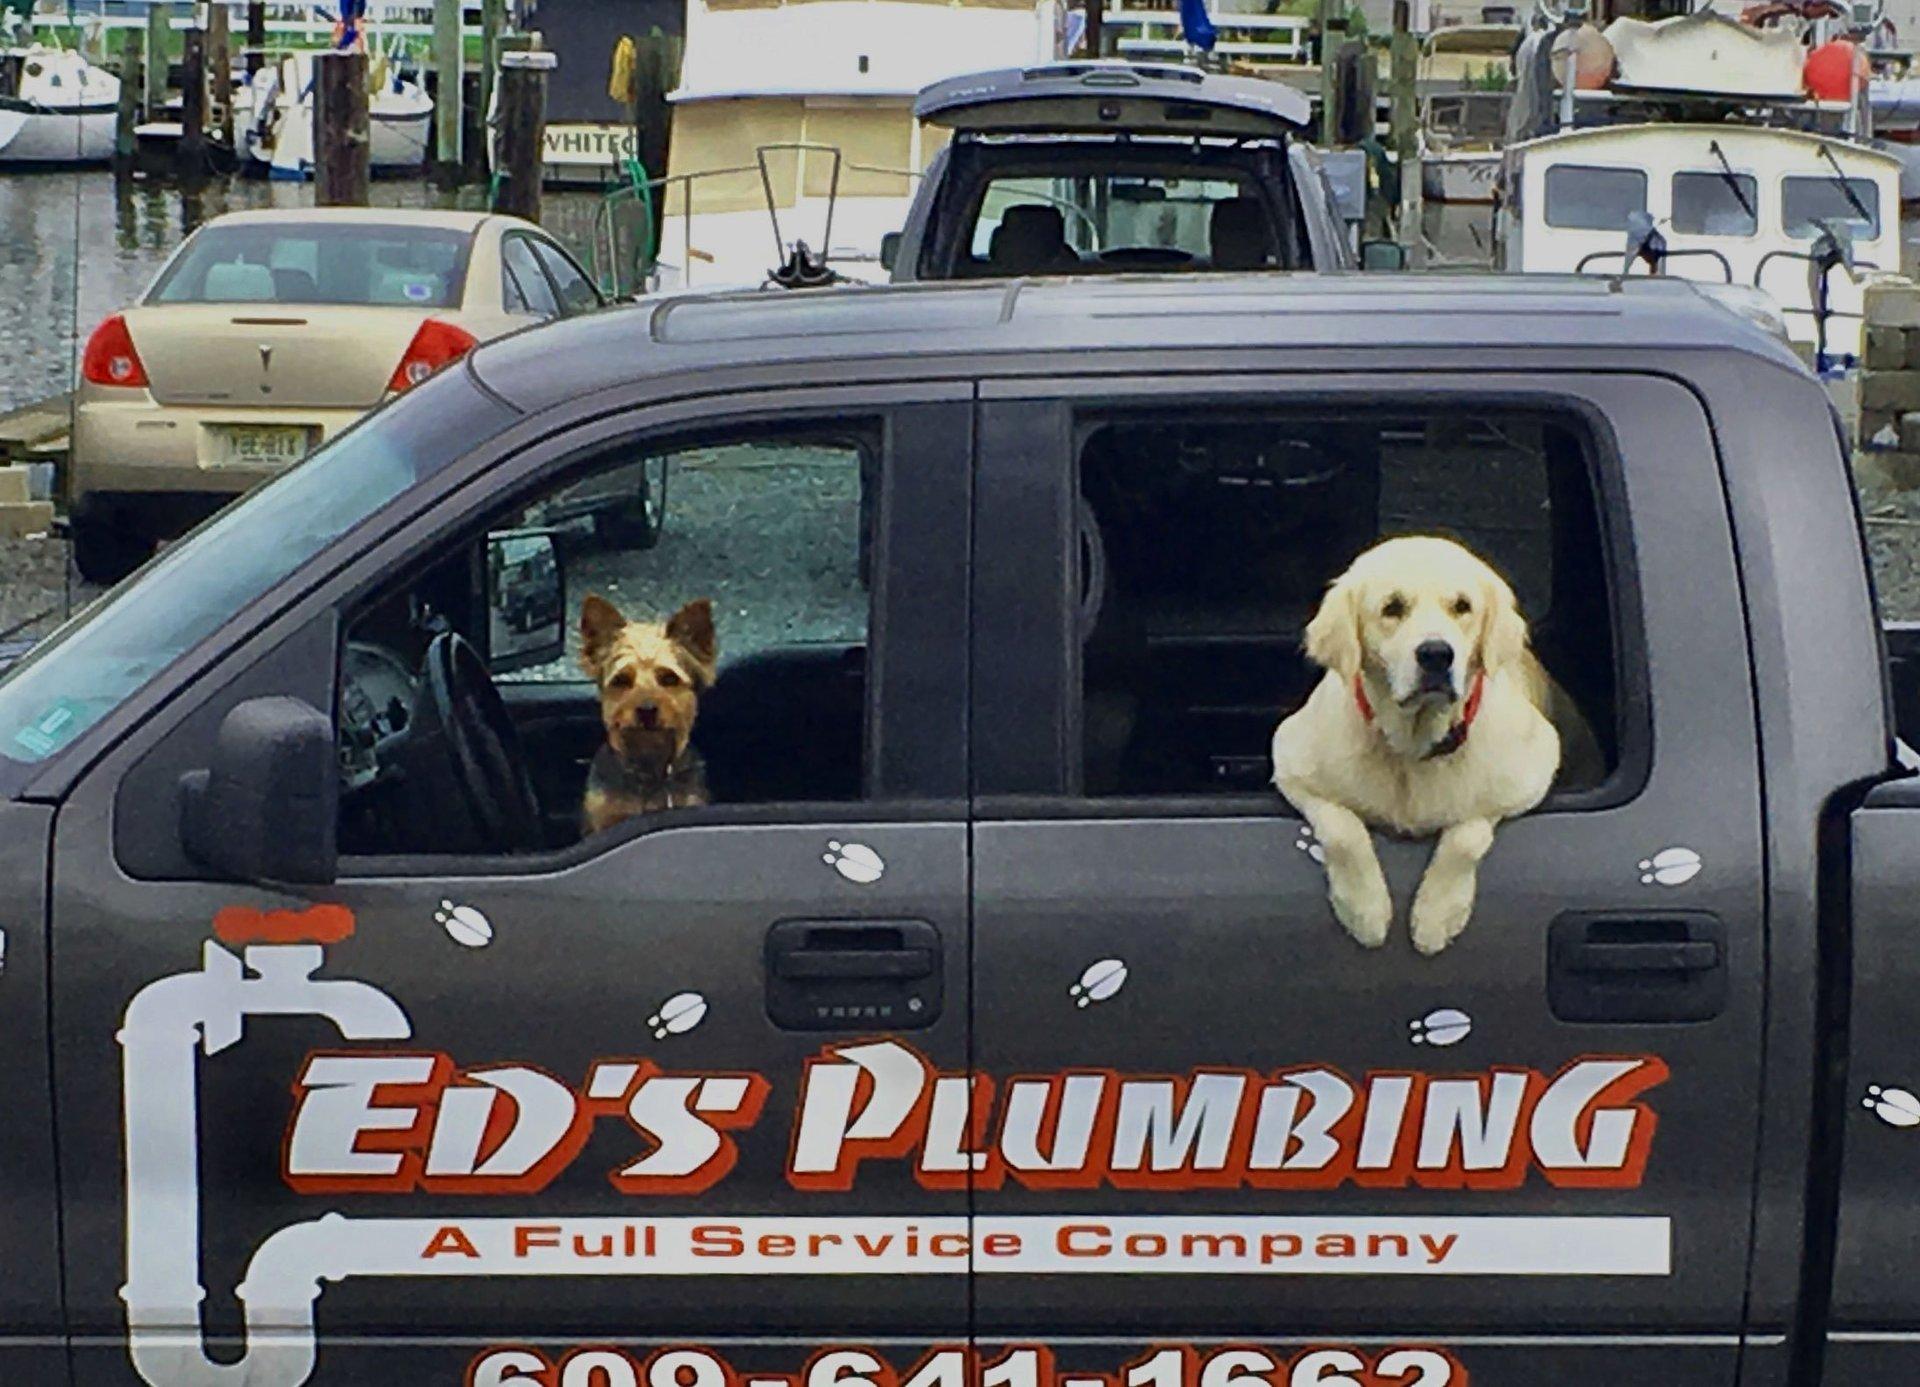 Ed's Plumbing, Inc. Truck